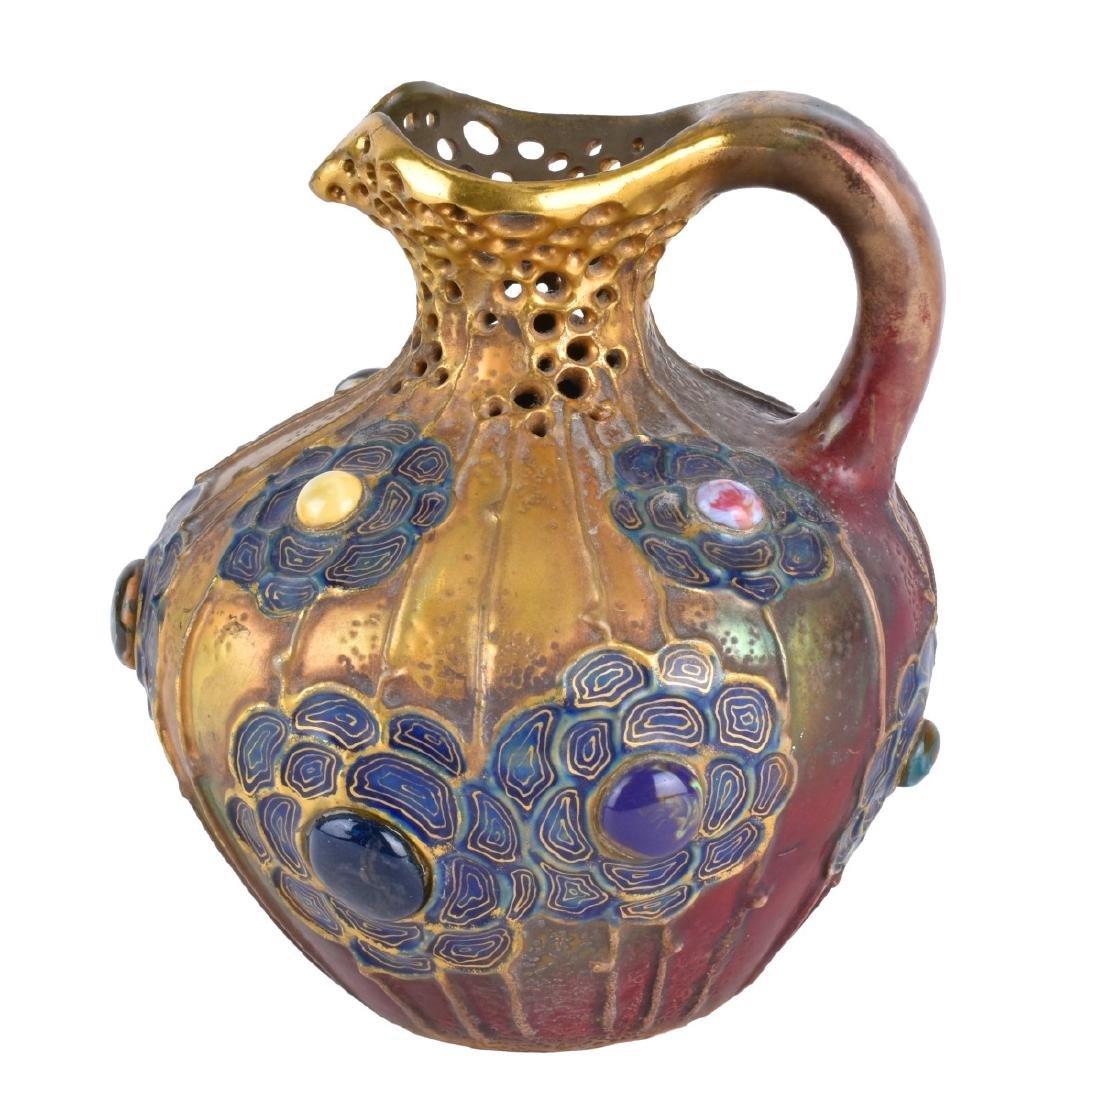 Werke Reissner Amphora Gres Bijou Pottery Ewer